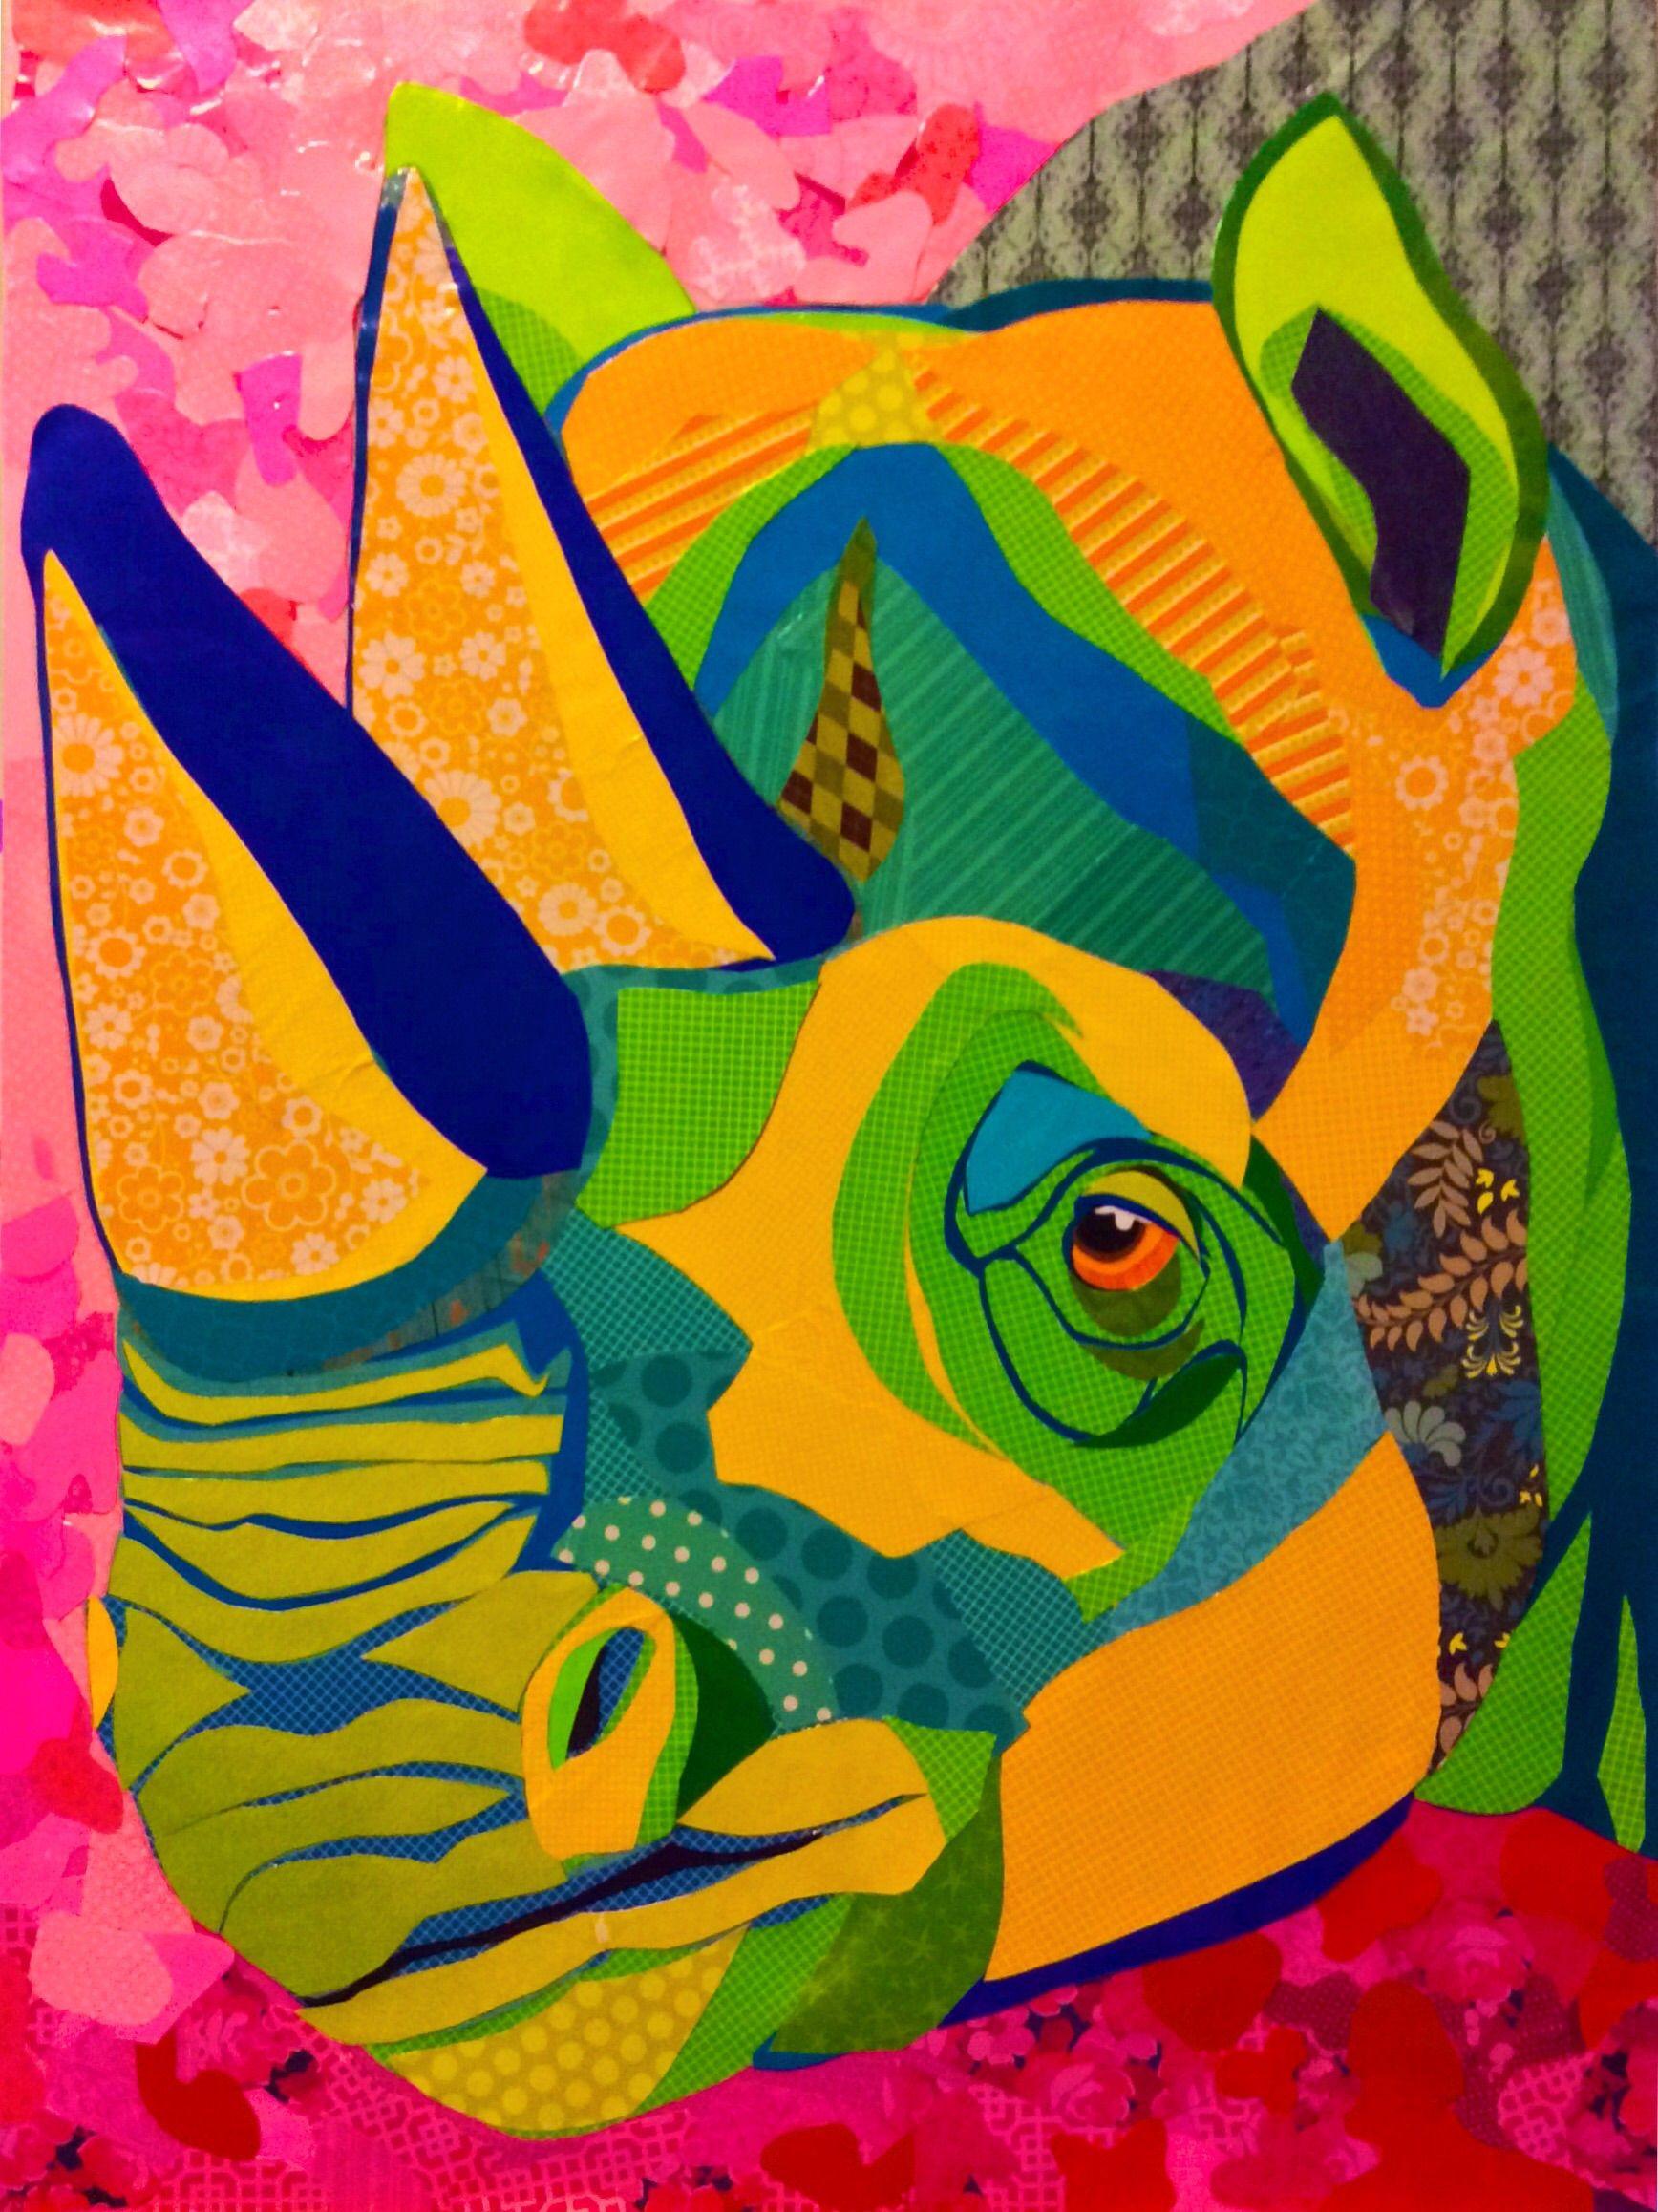 Scrapbook paper collage - Cut Paper Collage Art 24 X32 On Board Razzmatazz Rhino By